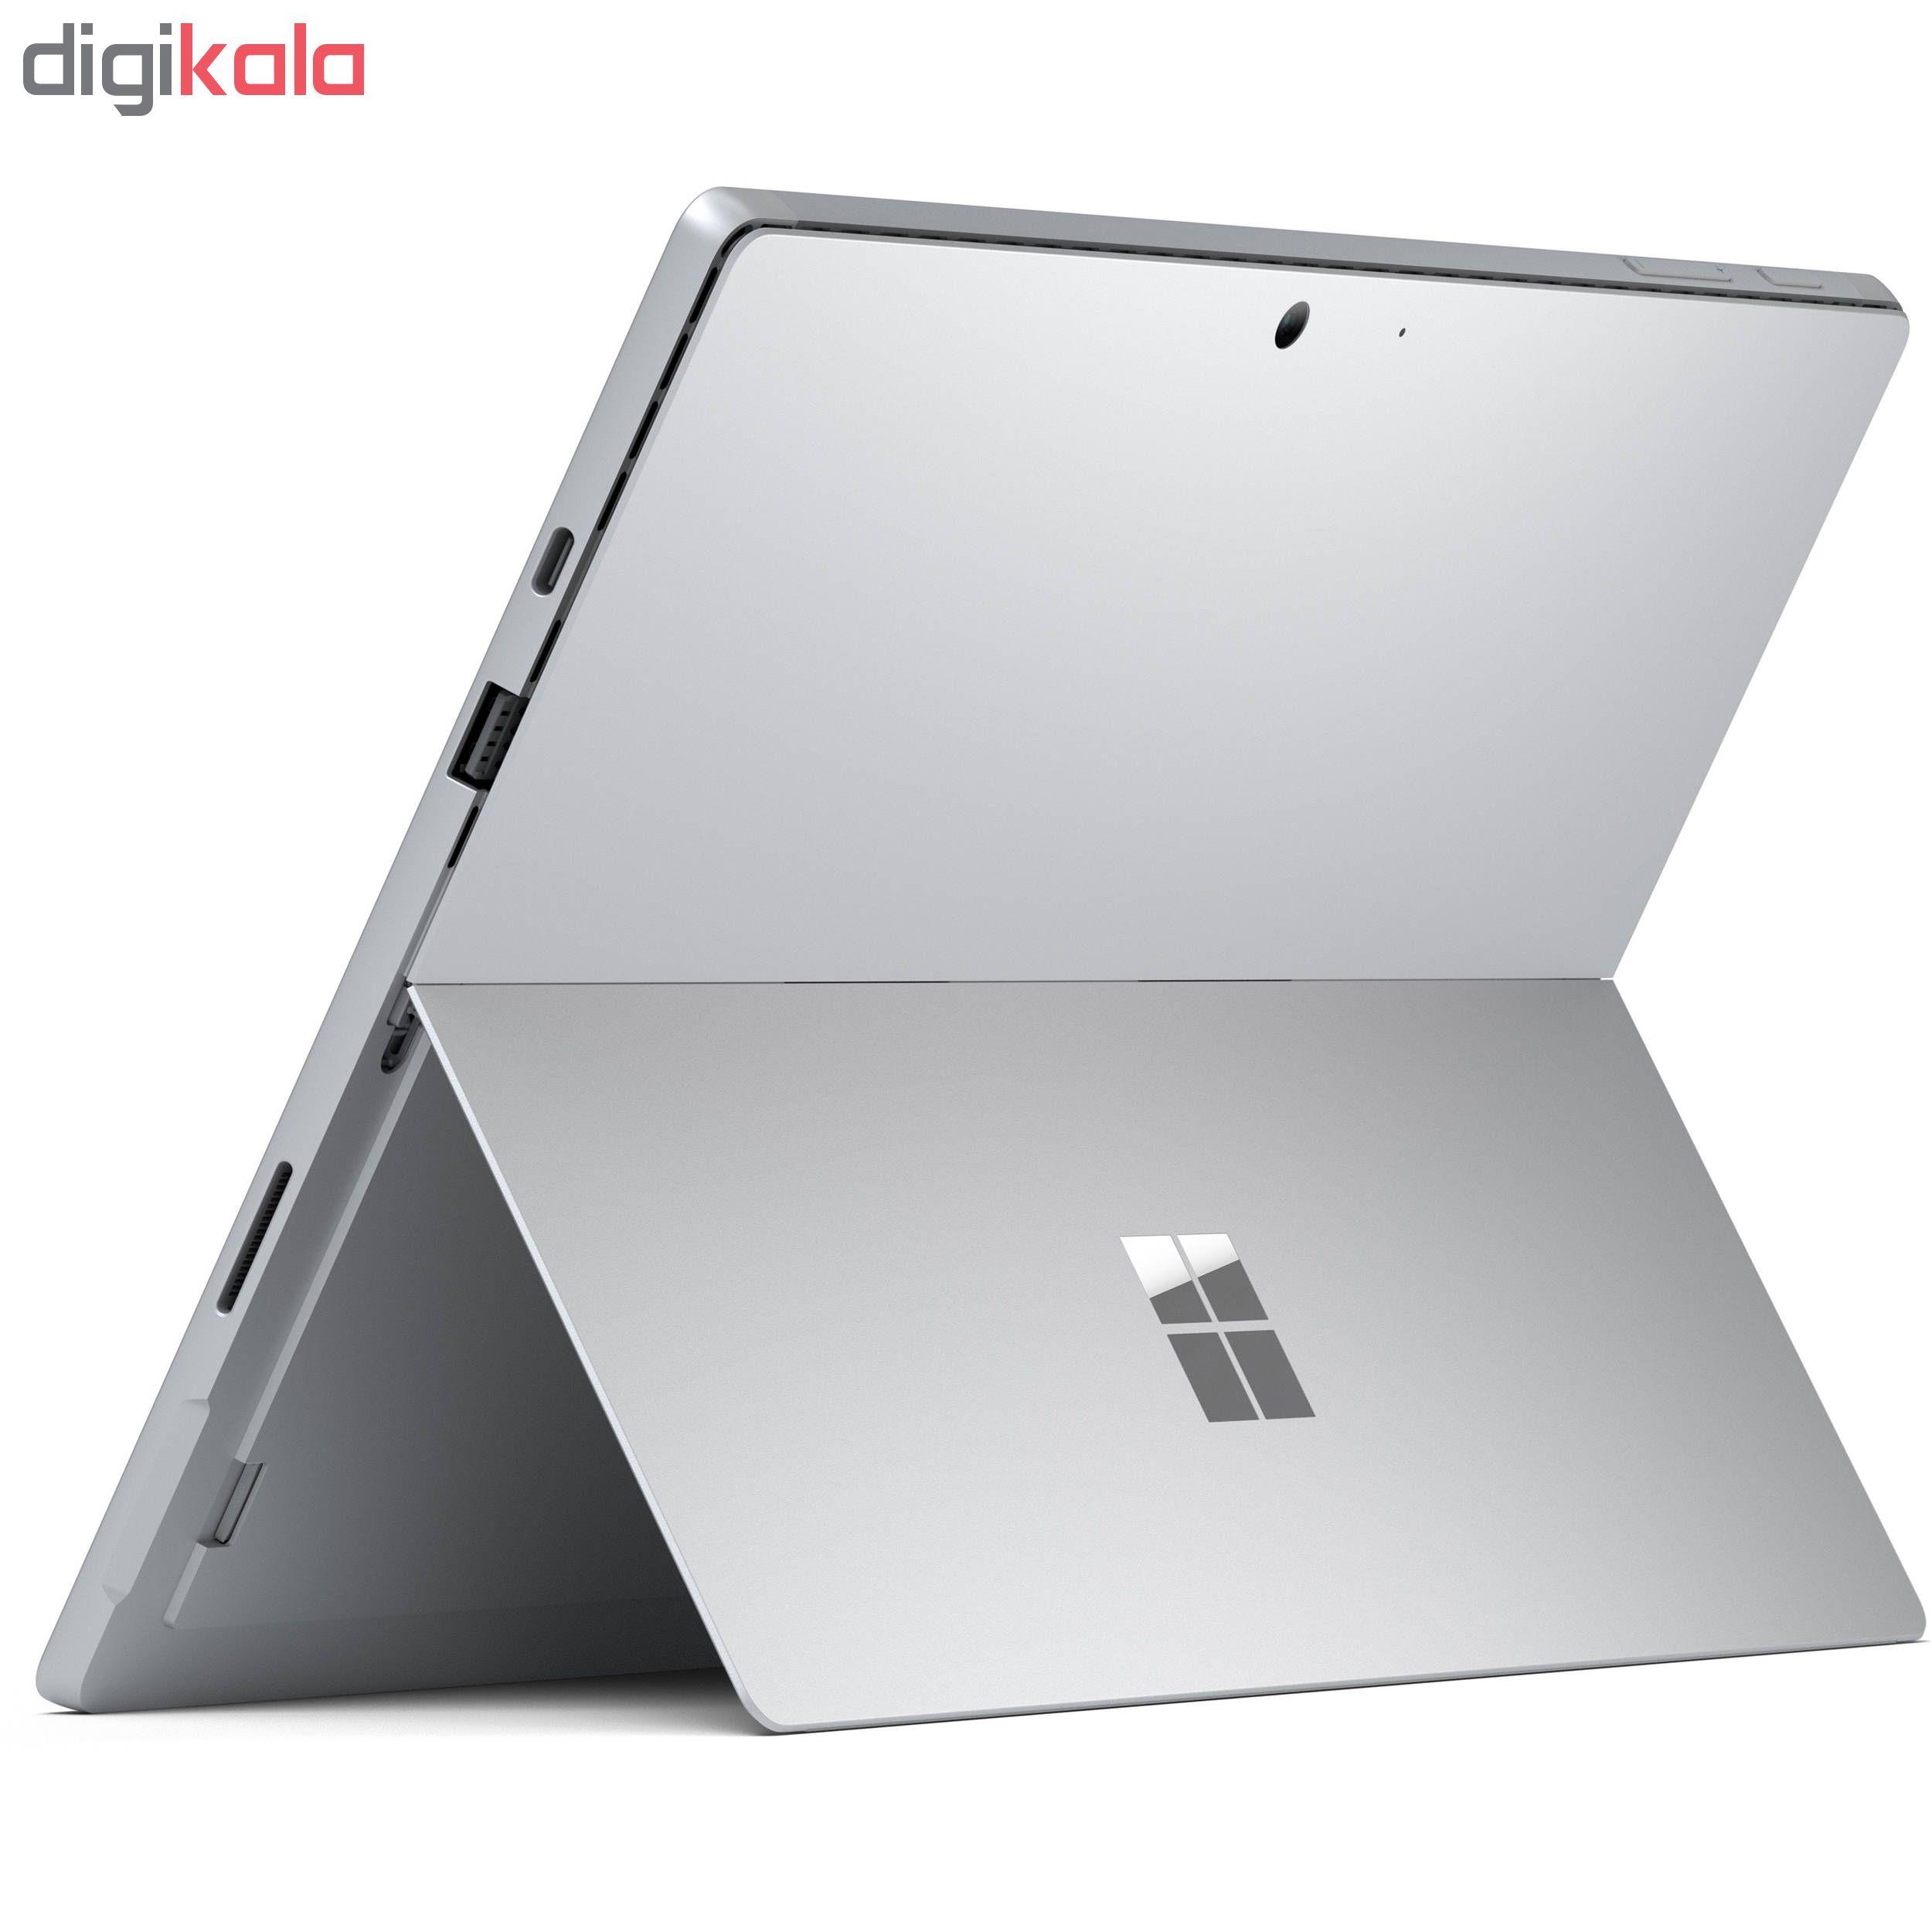 تبلت مایکروسافت مدل Surface Pro 7 - F به همراه کیبورد Black Type Cover main 1 6